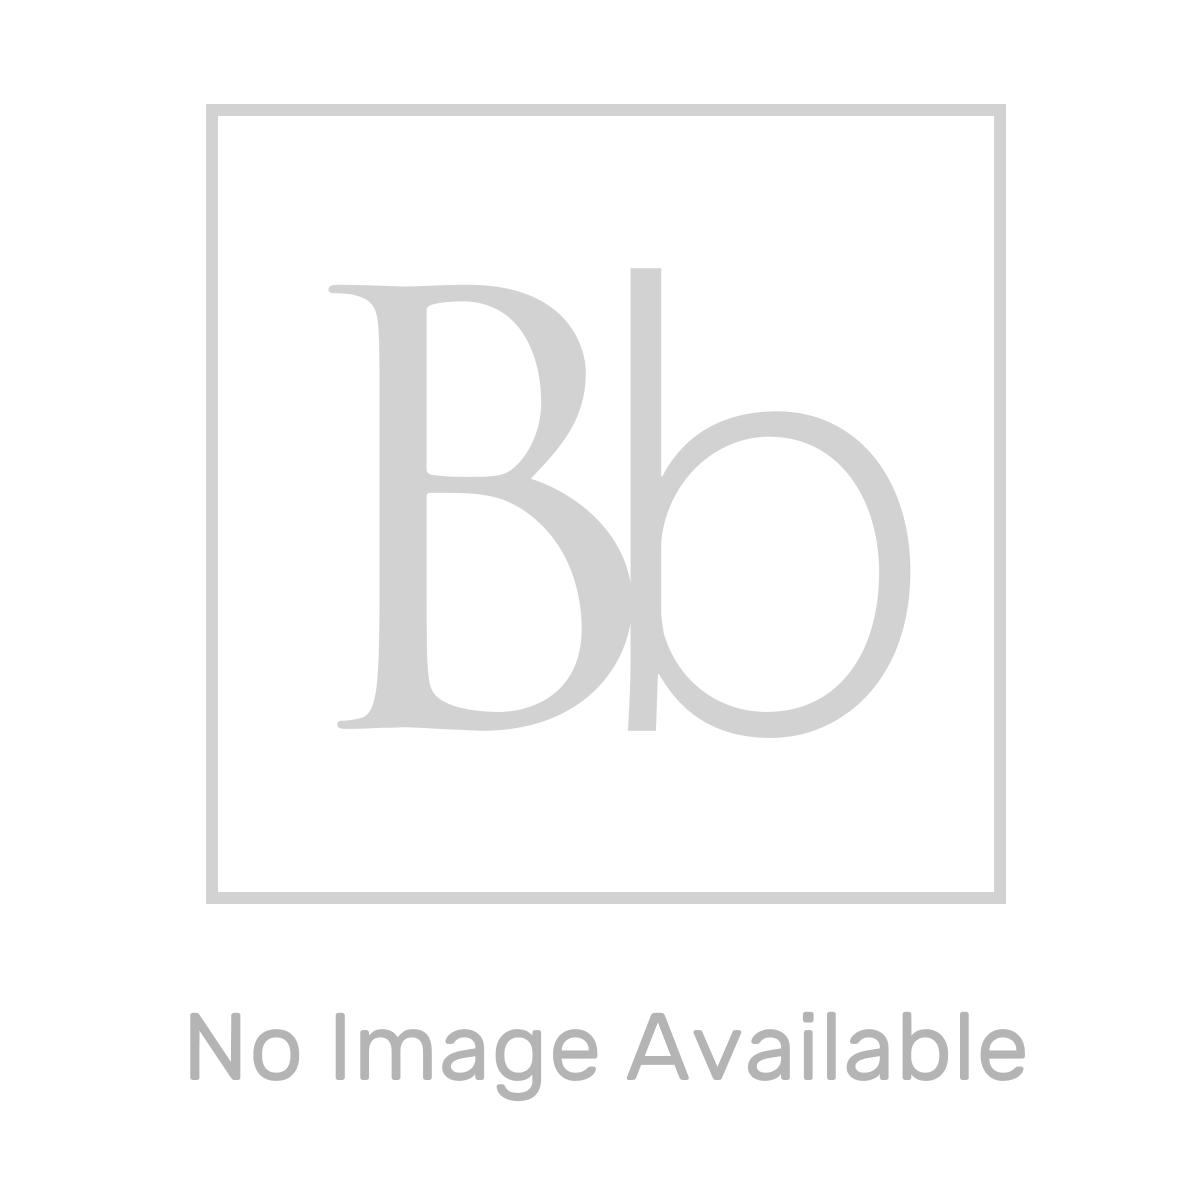 Zenith Form Bath Shower Mixer Tap Lifestyle